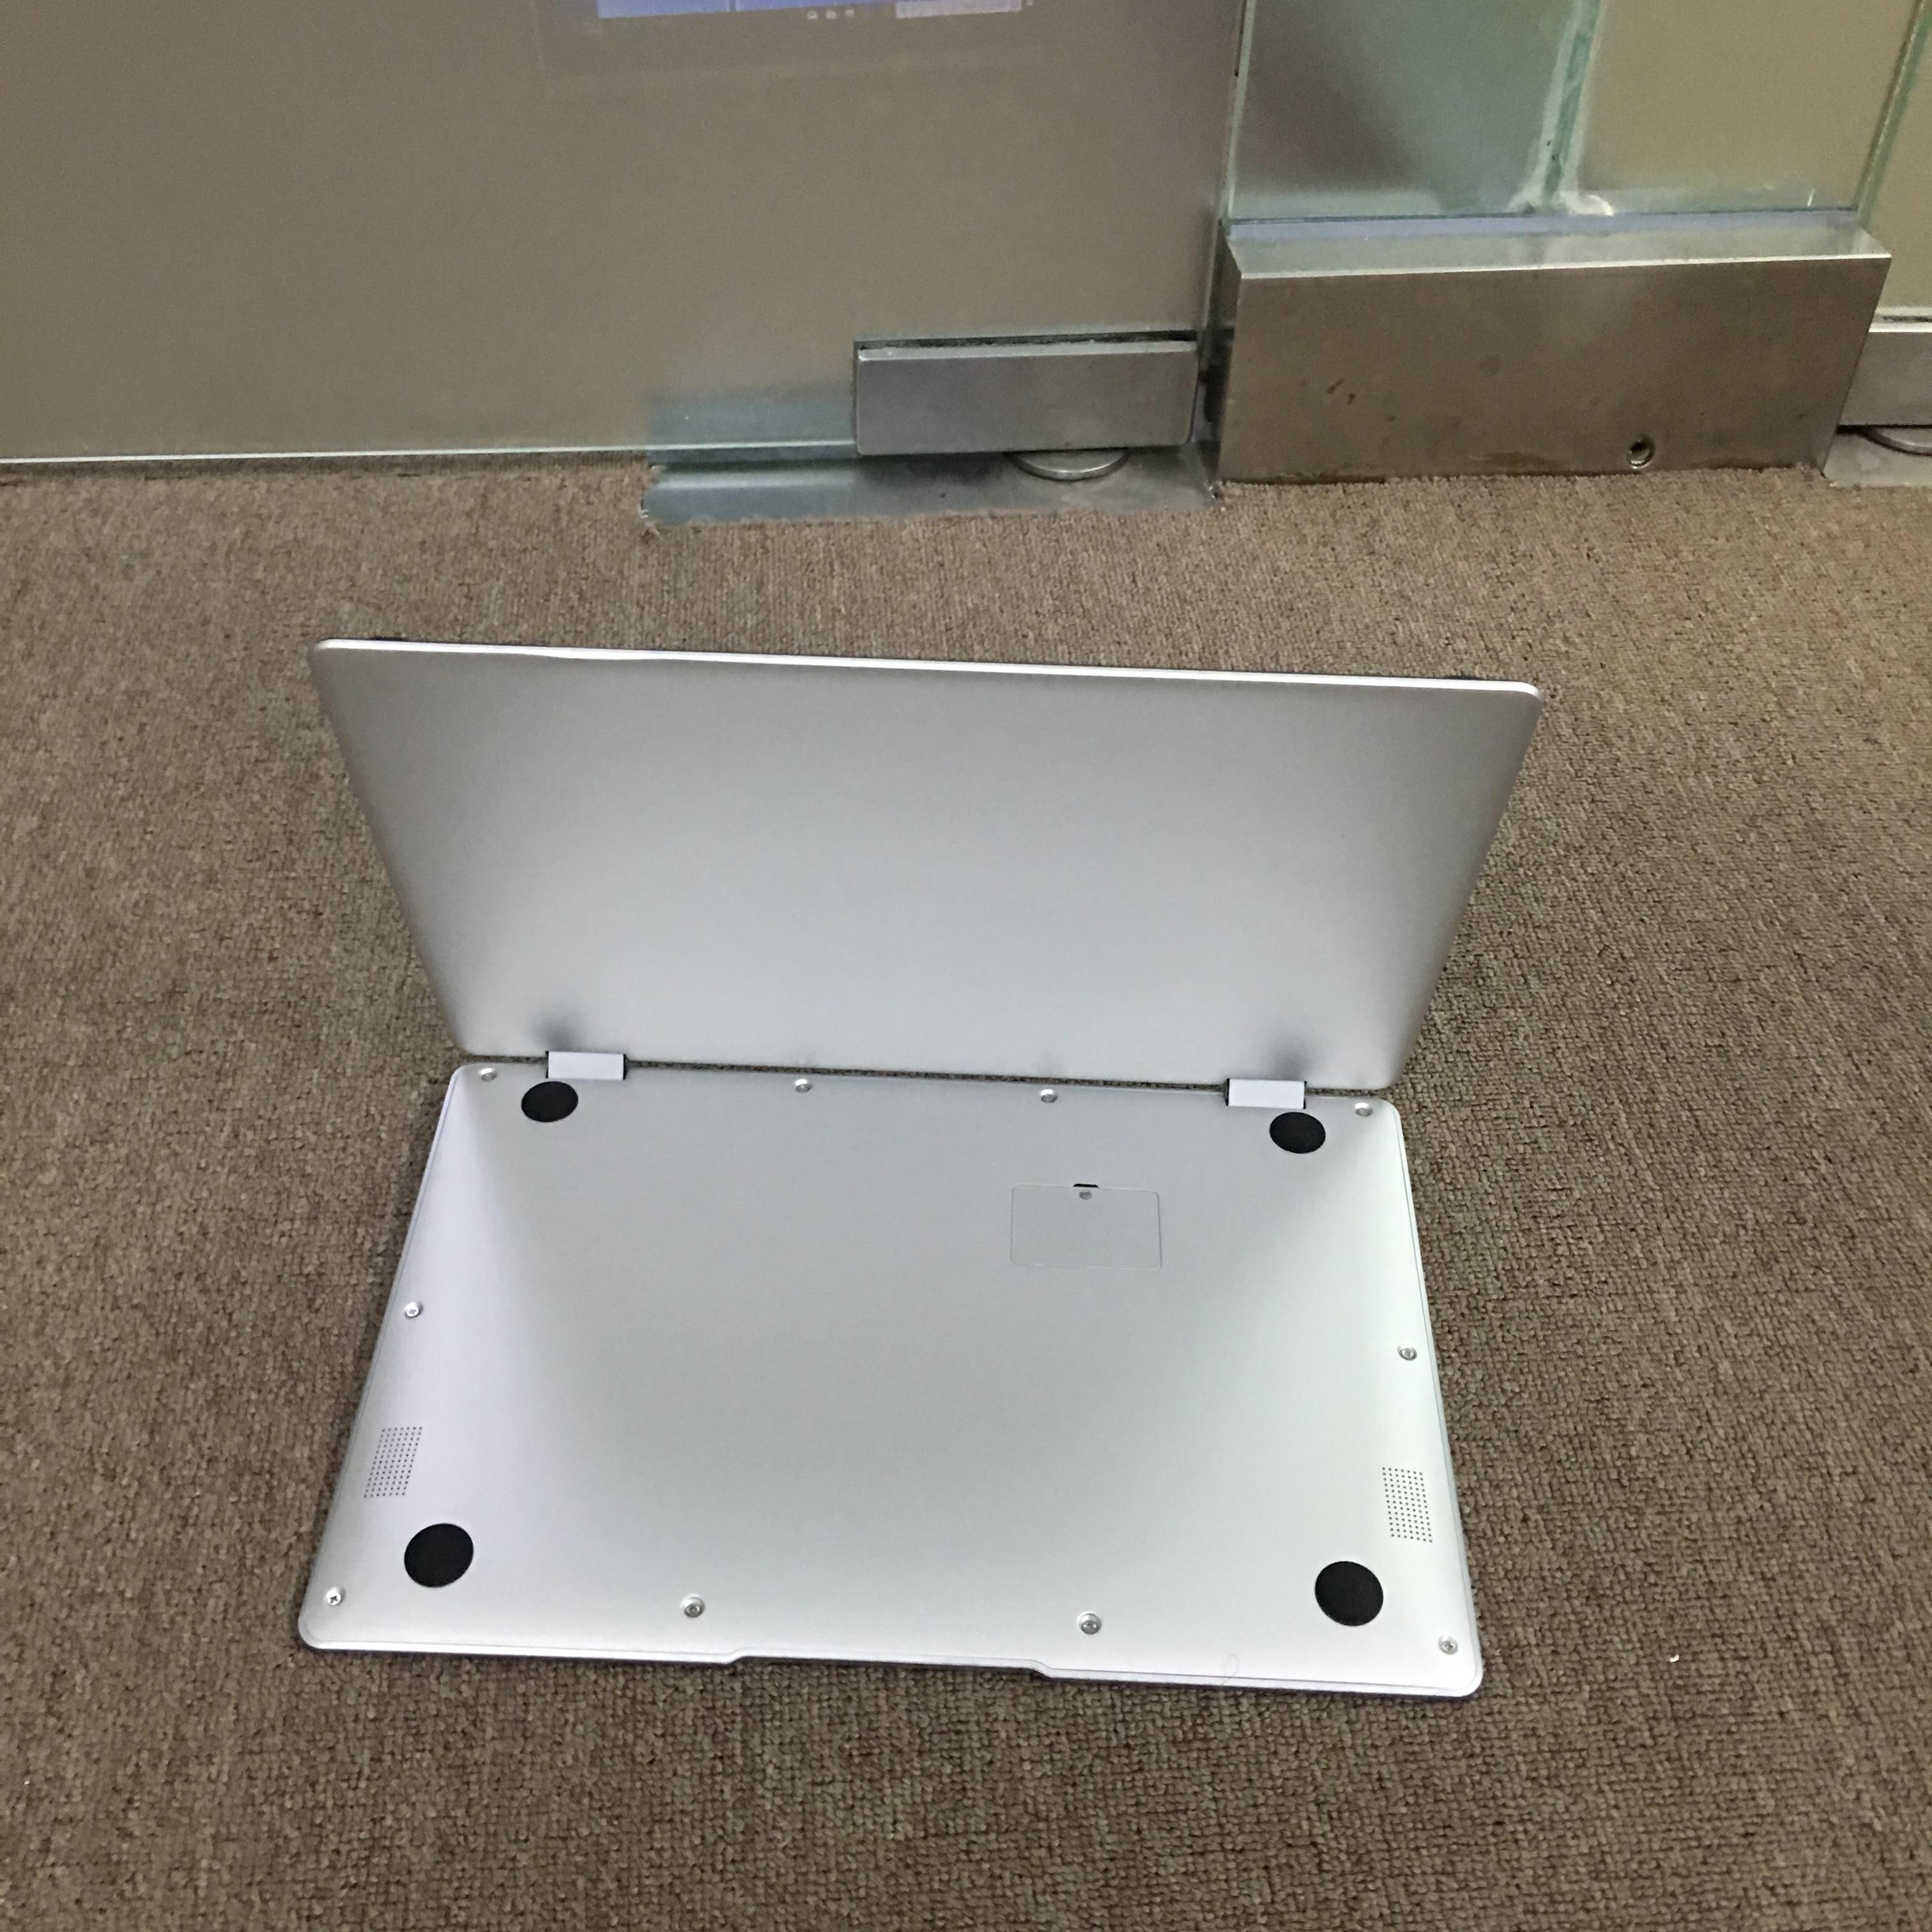 Light Weight Notebook Air 13.3 Inch Laptops Intel Core I5-8250U 8GB 256GB Mini Laptop